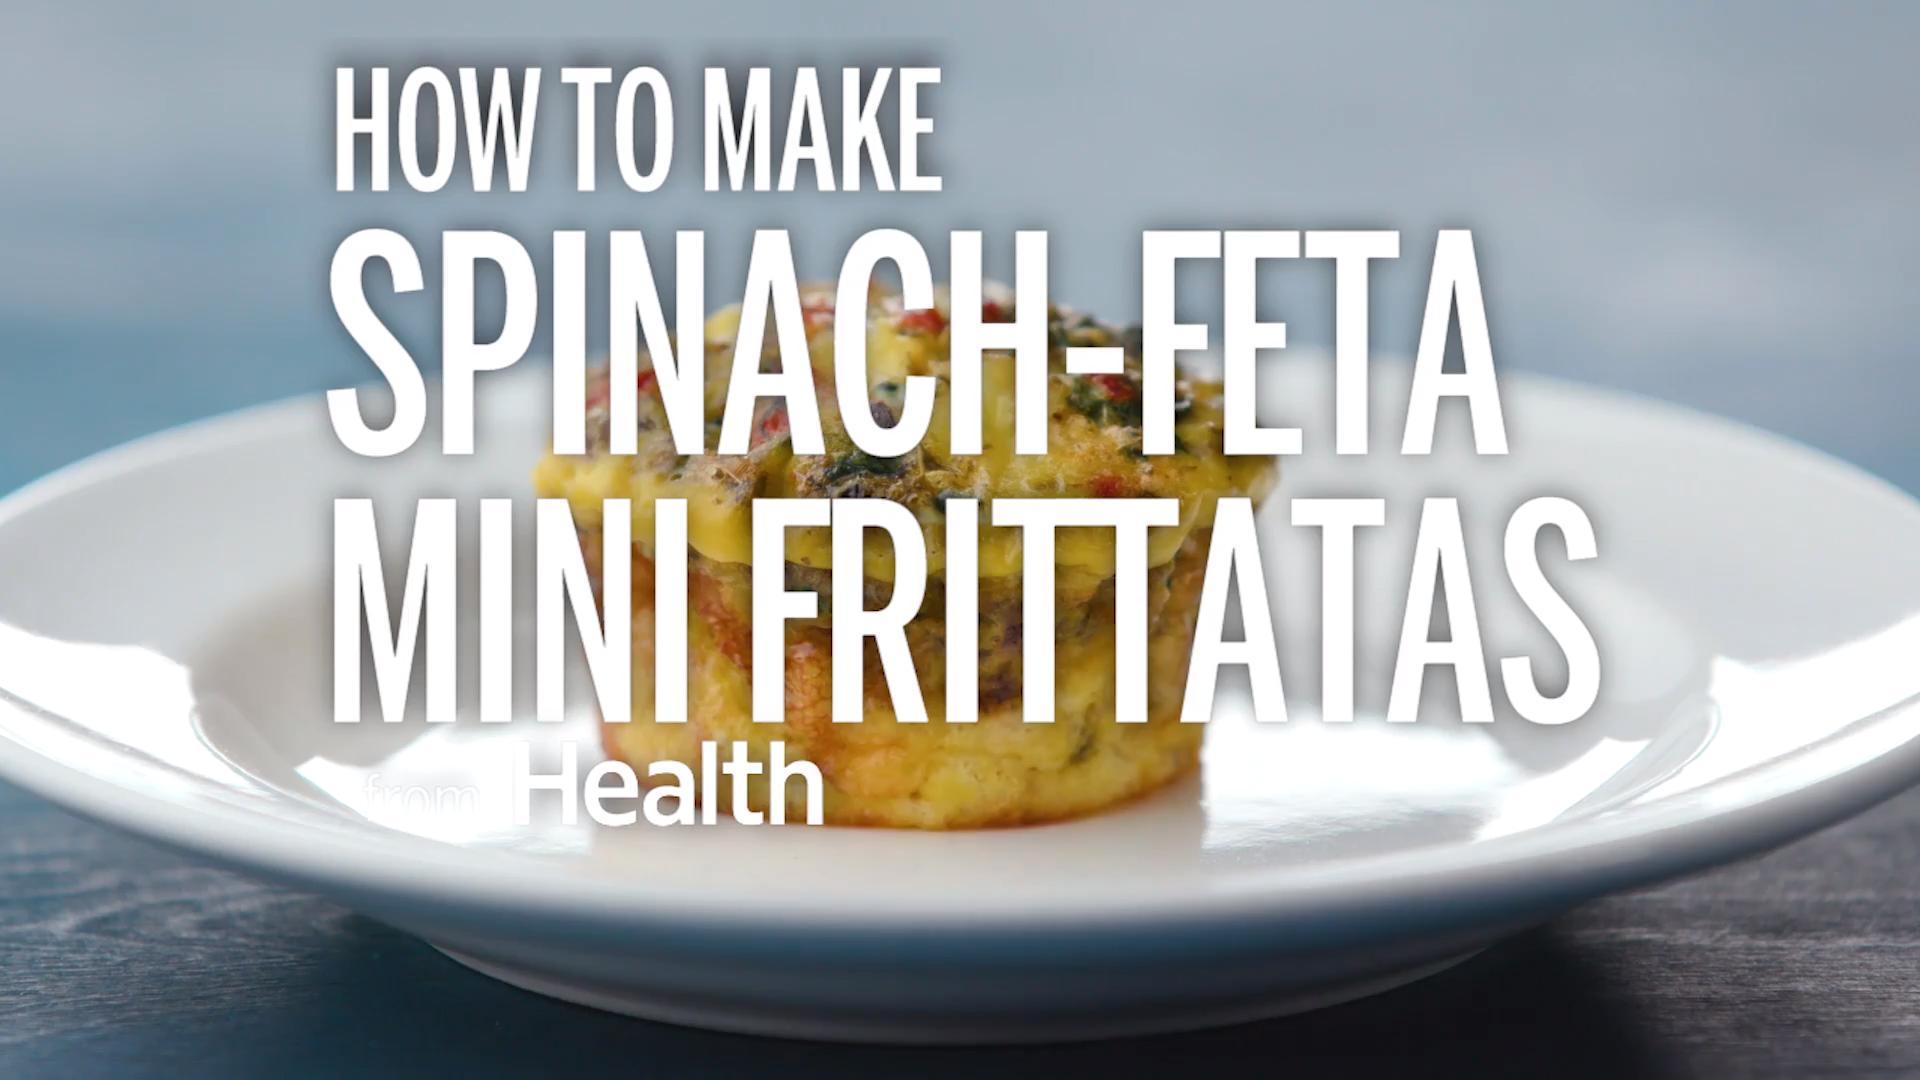 Spinach-Feta Mini Frittatas